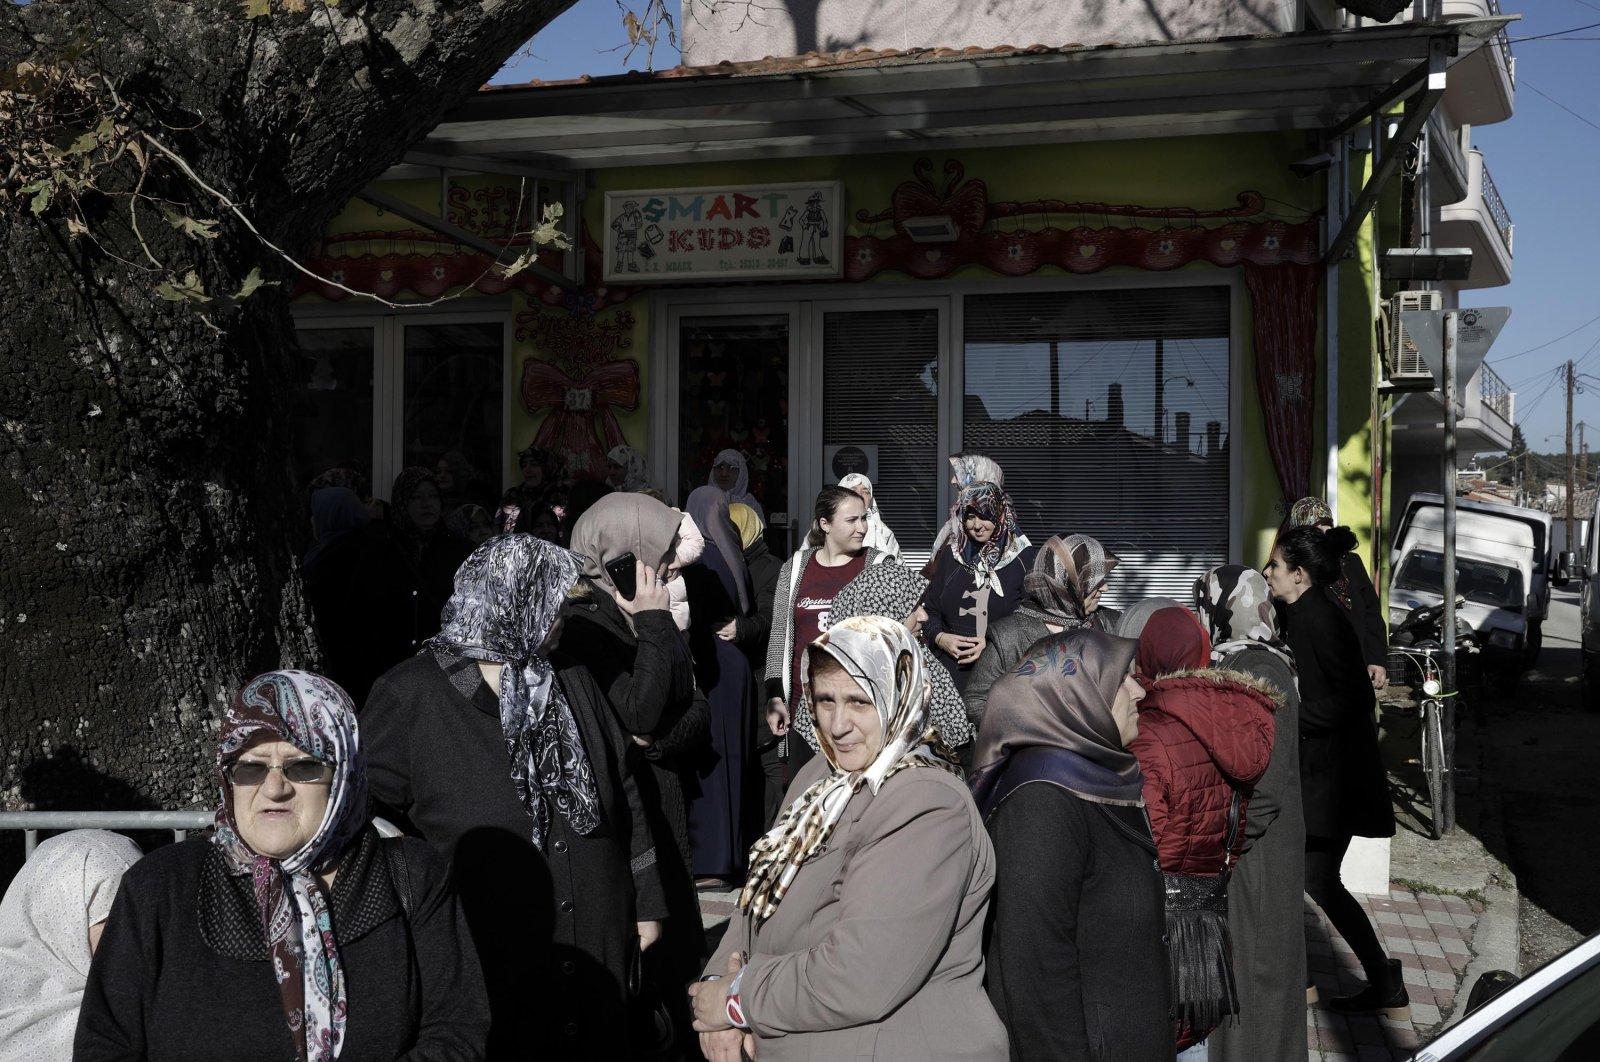 Residents of the Muslim community wait for the arrival of President Recep Tayyip Erdoğan in Komotini (Gümülcine), Greece, Dec. 8, 2017. (Getty Images)